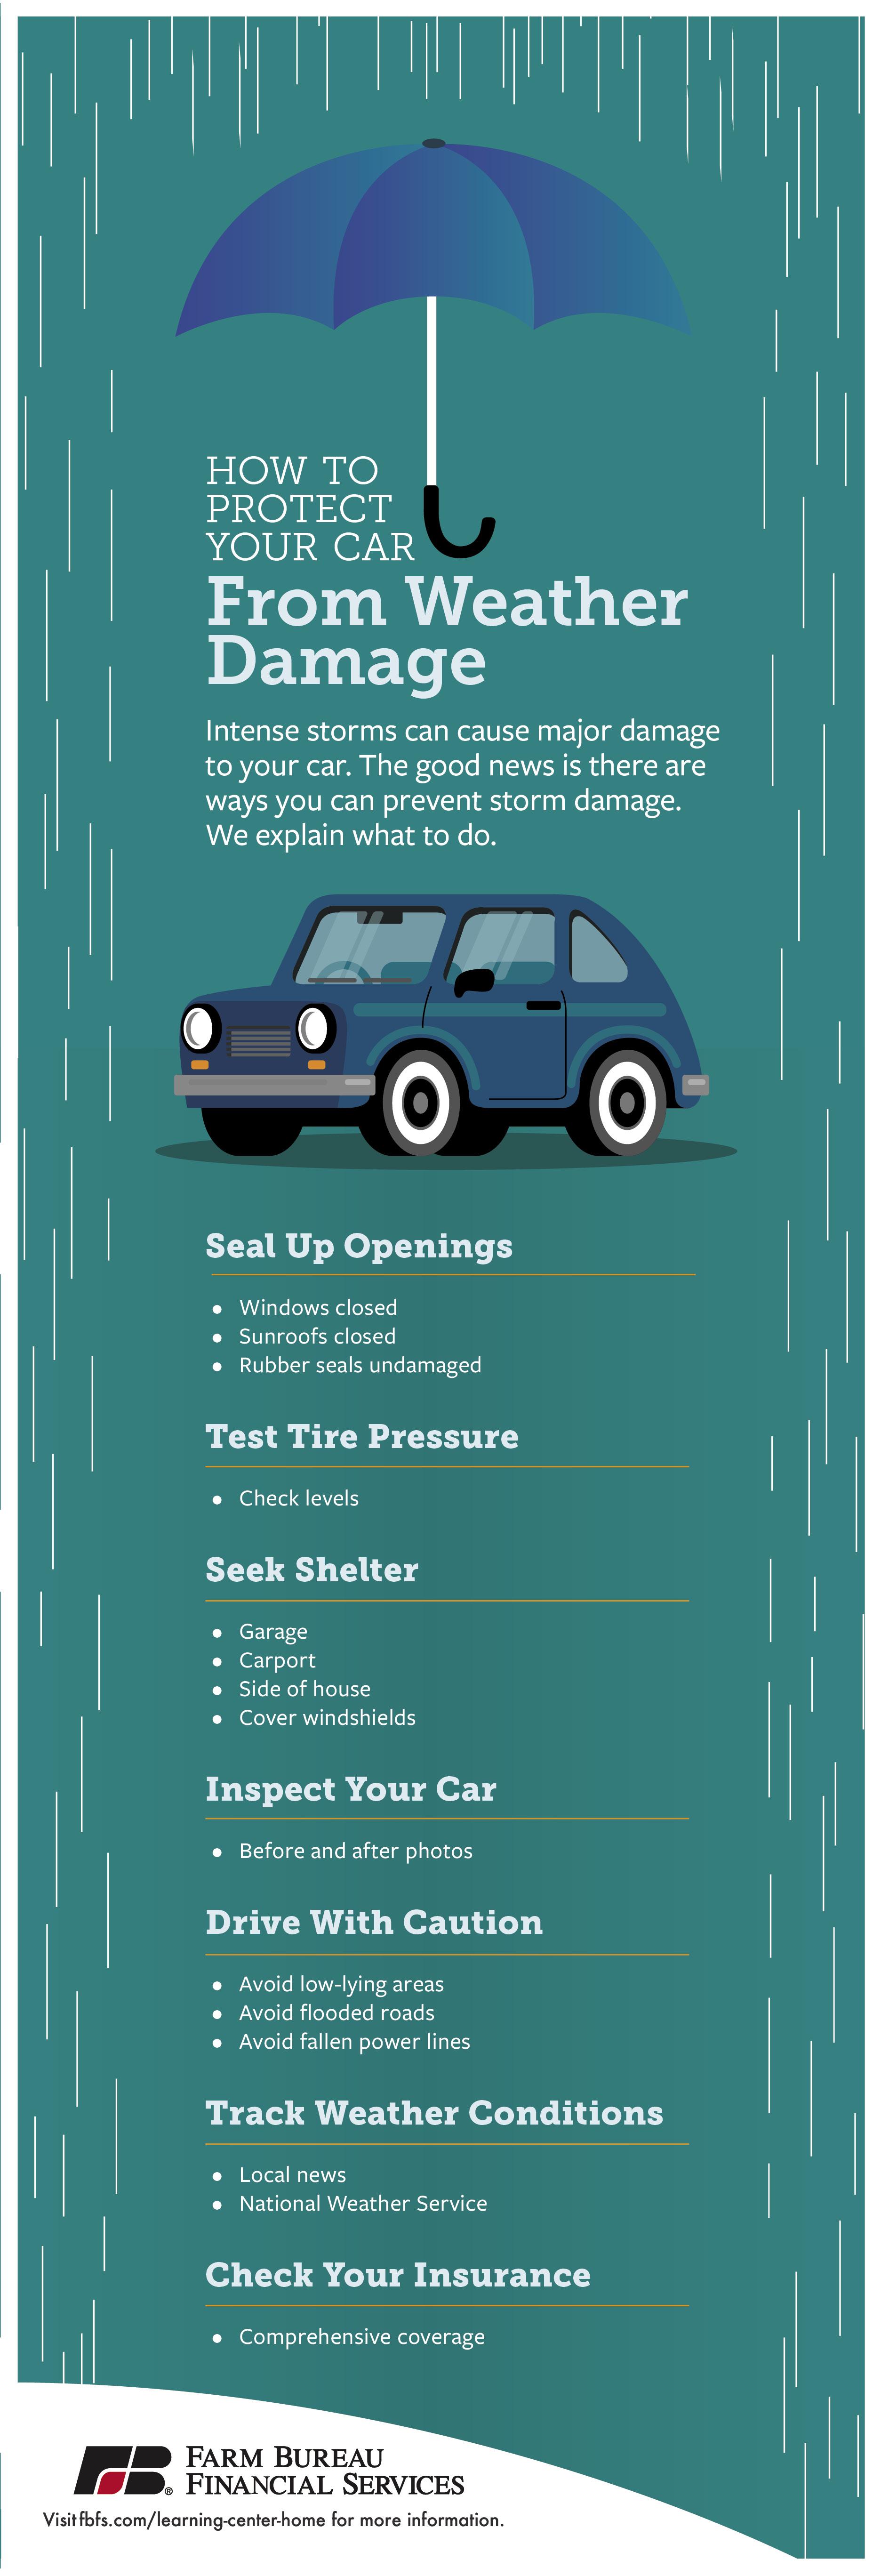 FBFS_CarWeatherDamage_Infographic